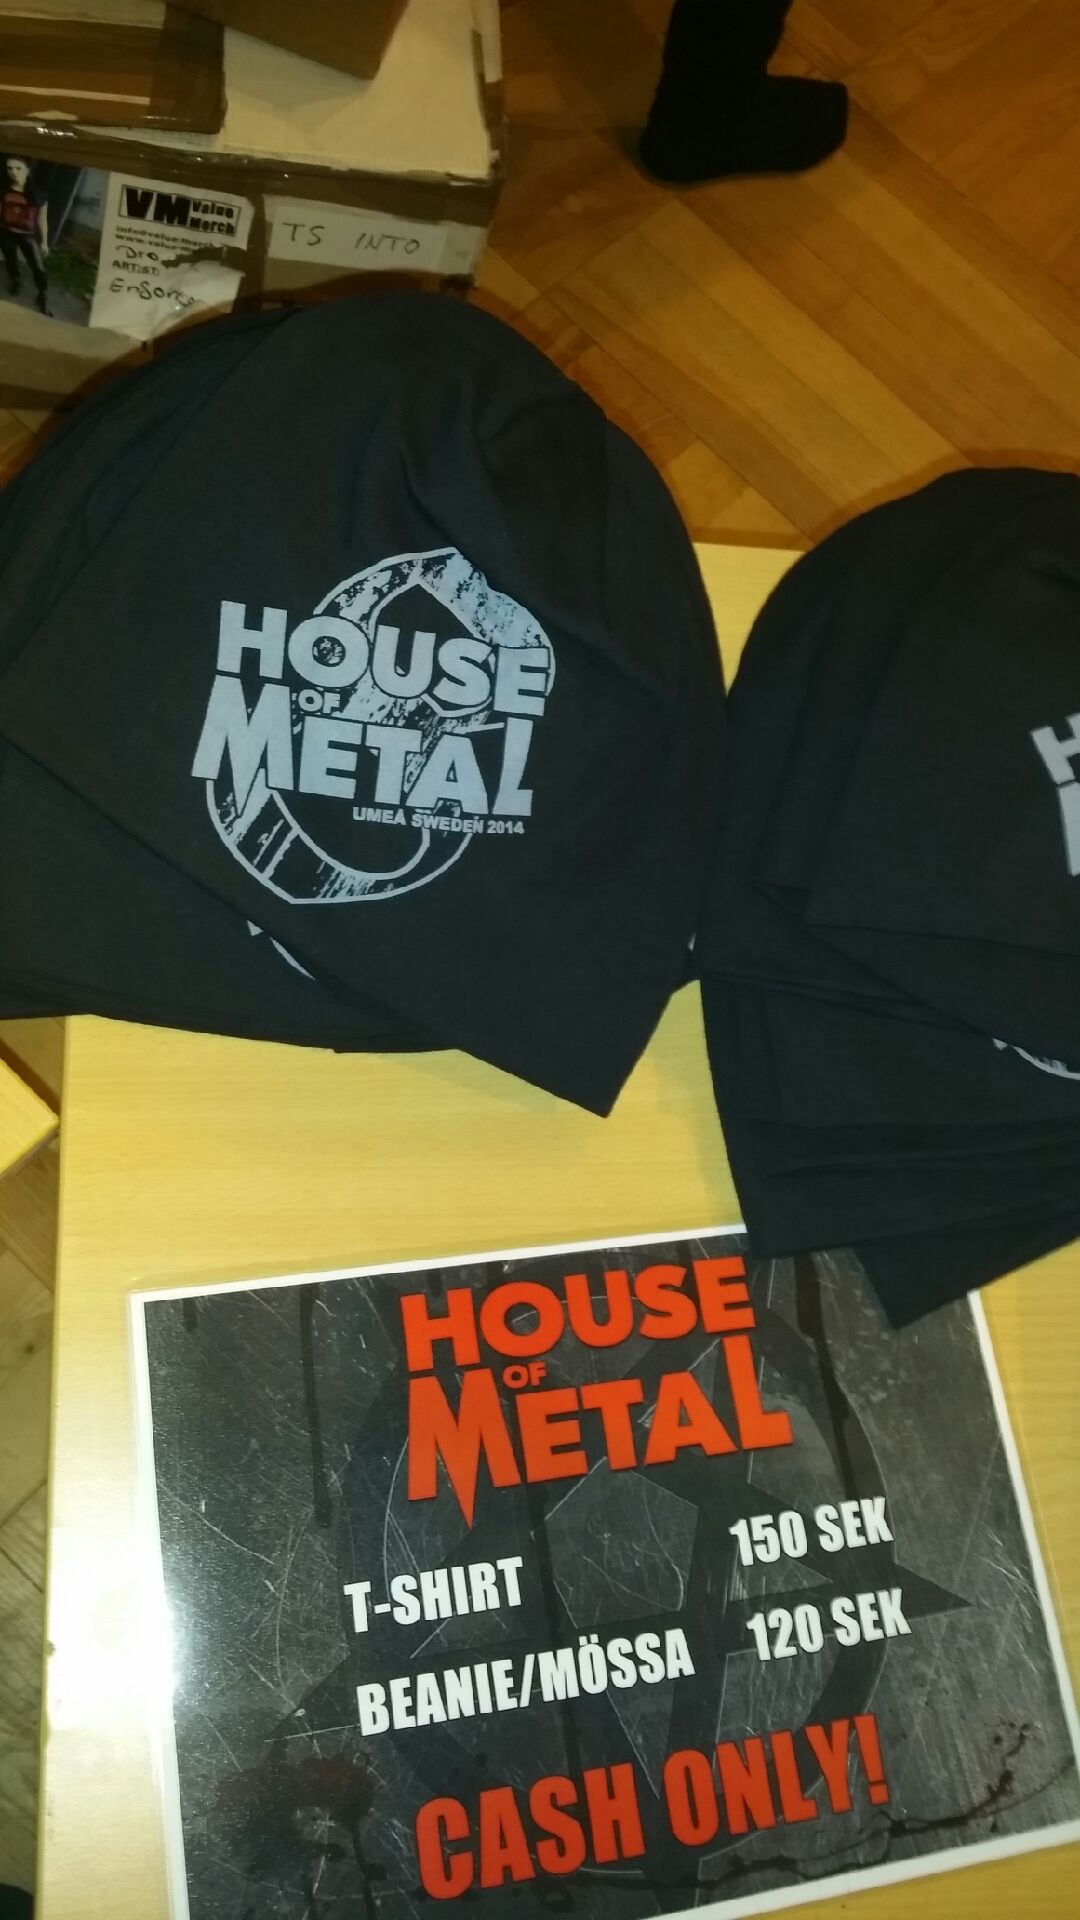 Missa inte årets outfits på metalhuset:)